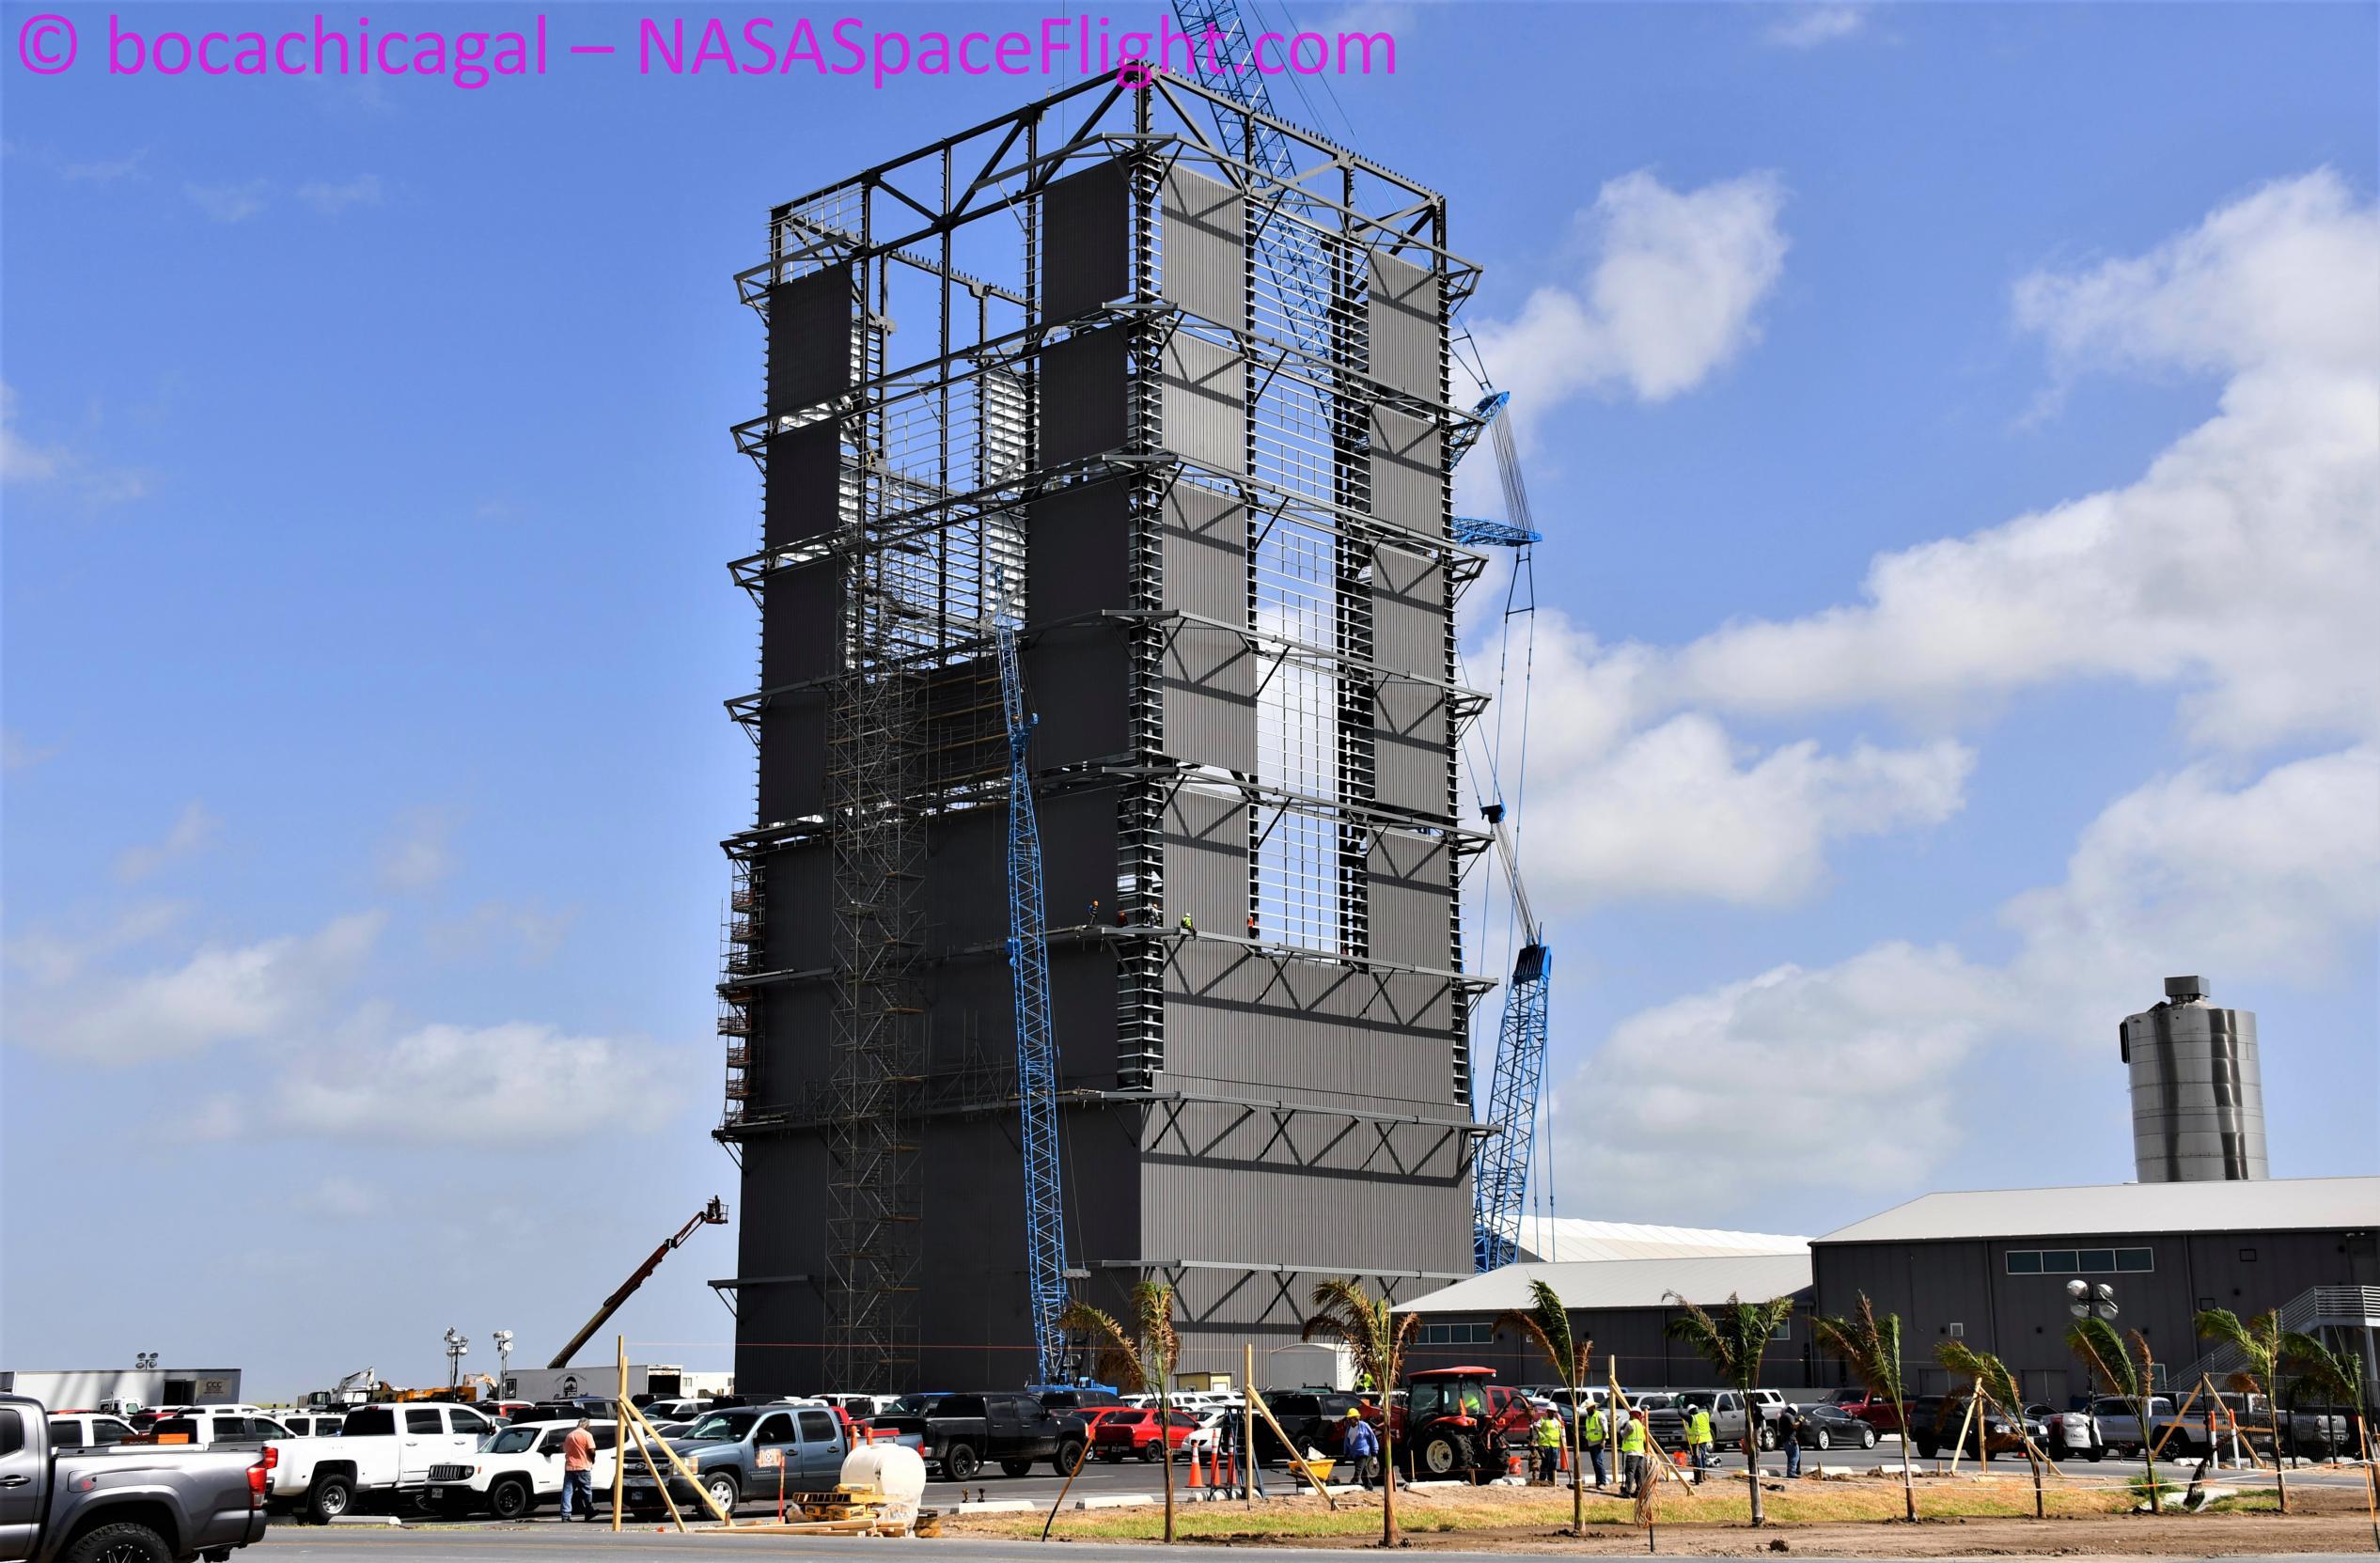 Starship Boca Chica 090220 (NASASpaceflight – bocachicagal) Super Heavy VAB 4 (c)